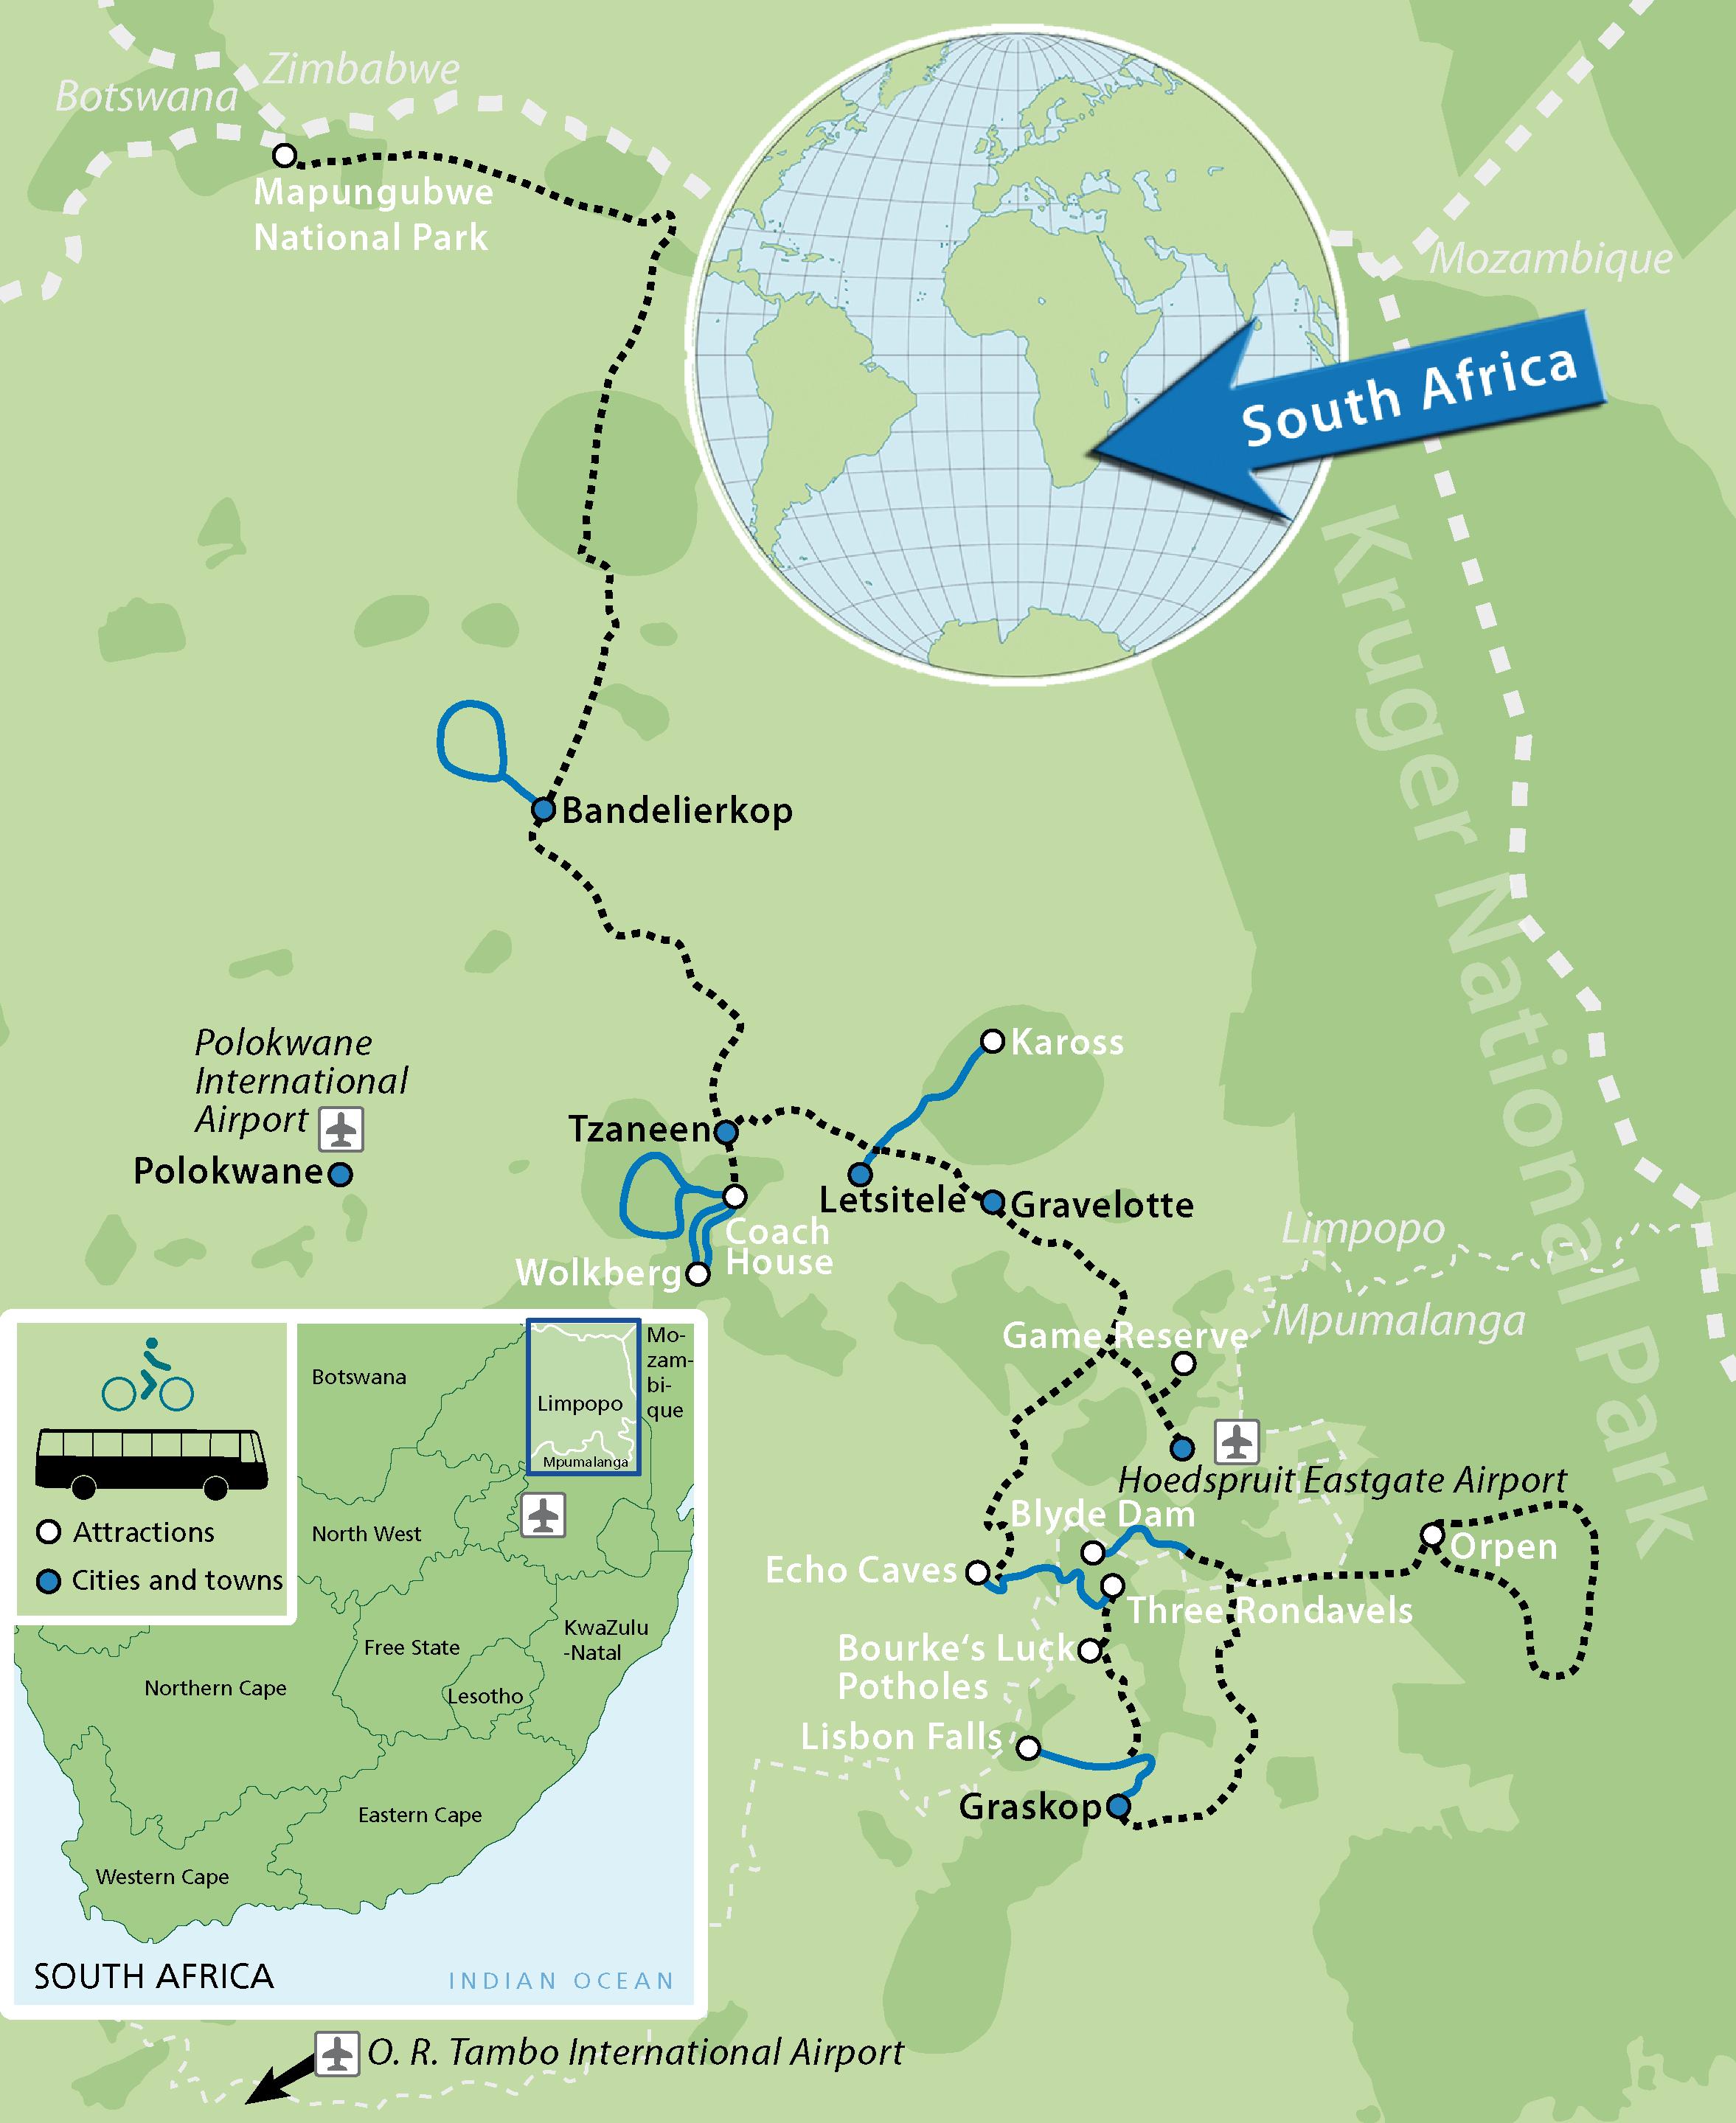 Safari Cycling Panorama Pedals Map